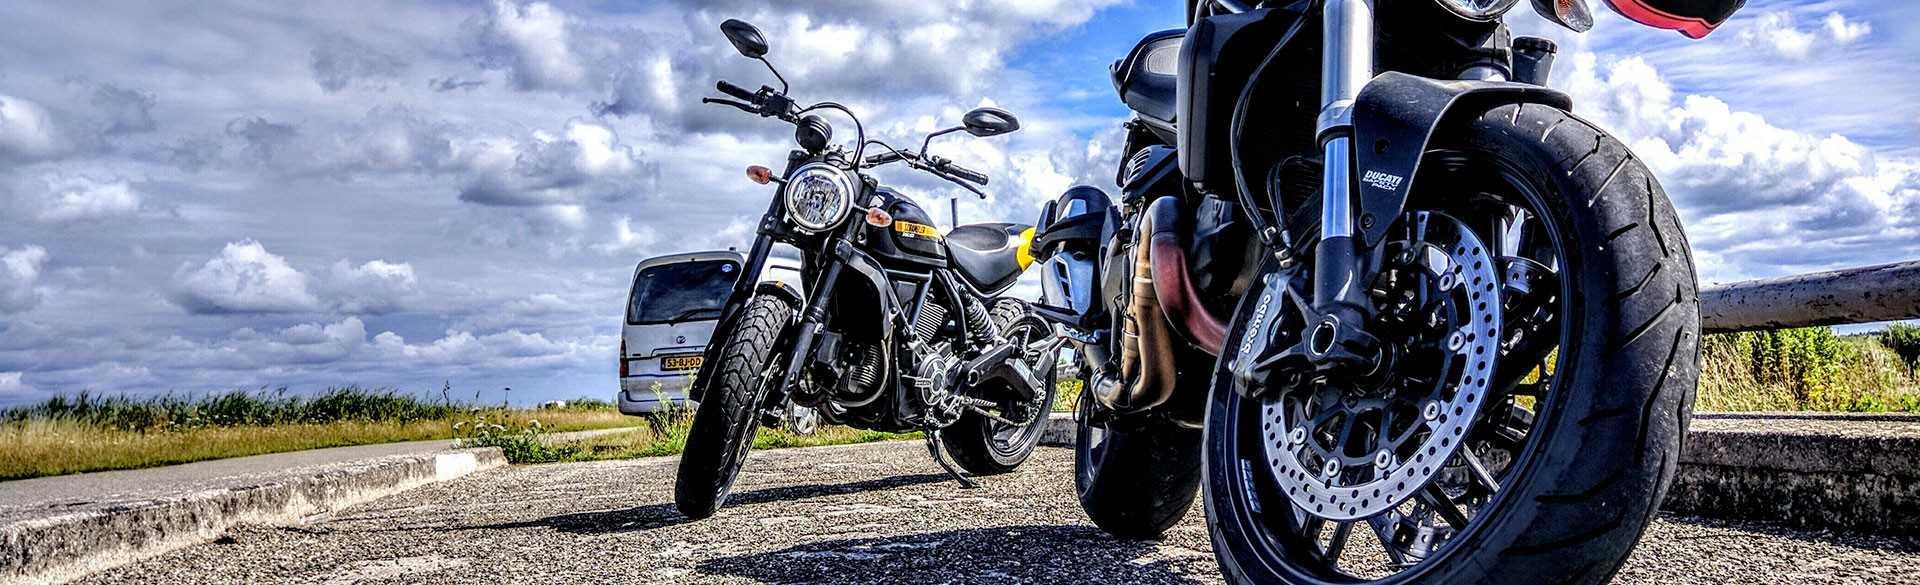 Vendita pneumatici moto online | GommeGo